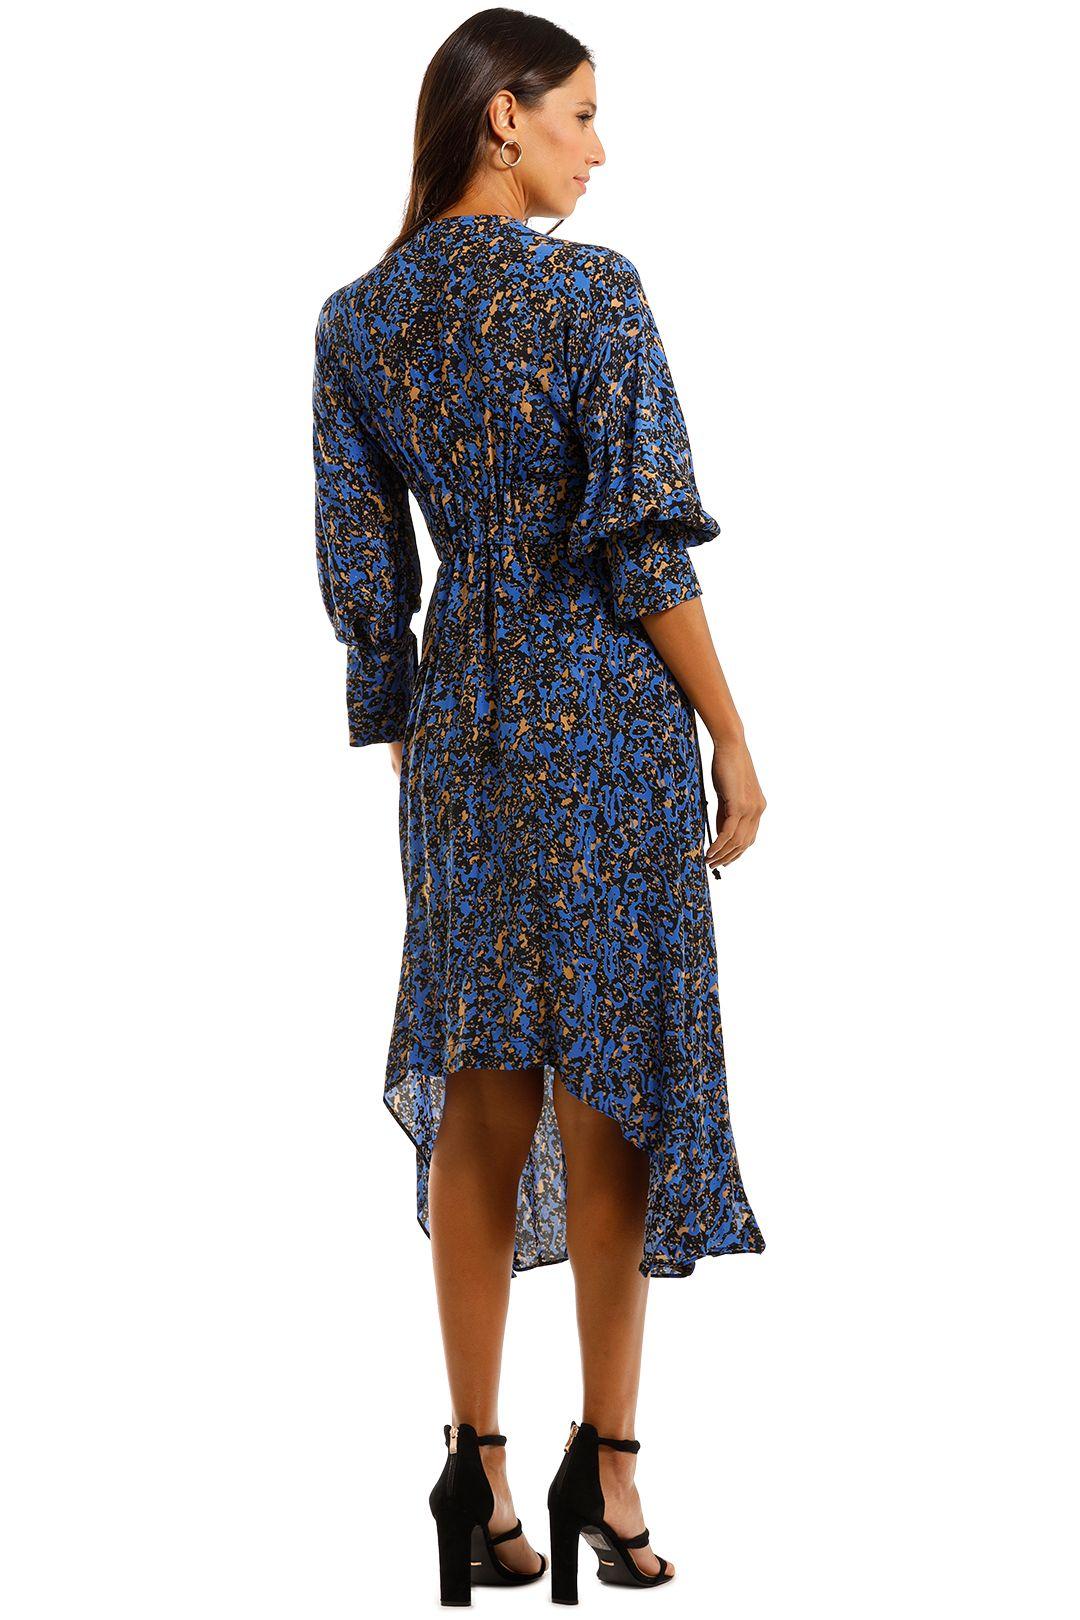 KITX Algae Future Dress Blue Midi Dress Asymmetric Skirt